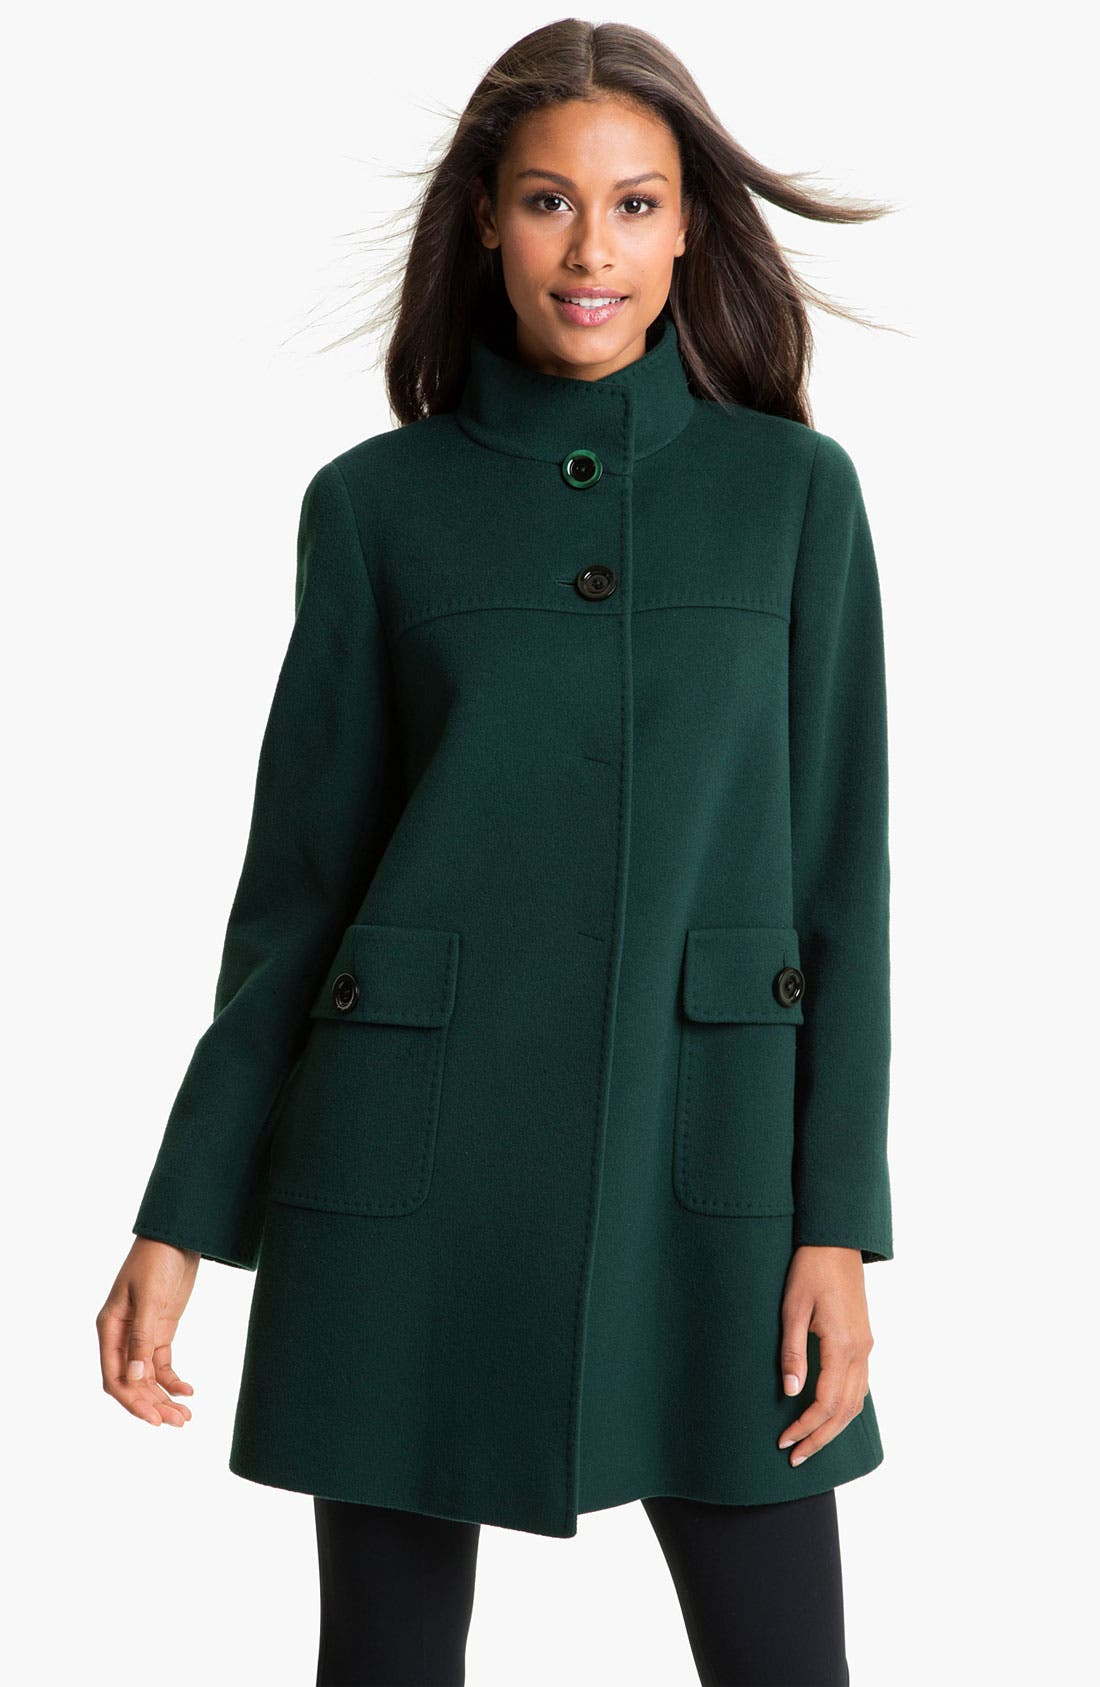 Alternate Image 1 Selected - Cinzia Rocca A-Line Wool Blend Coat